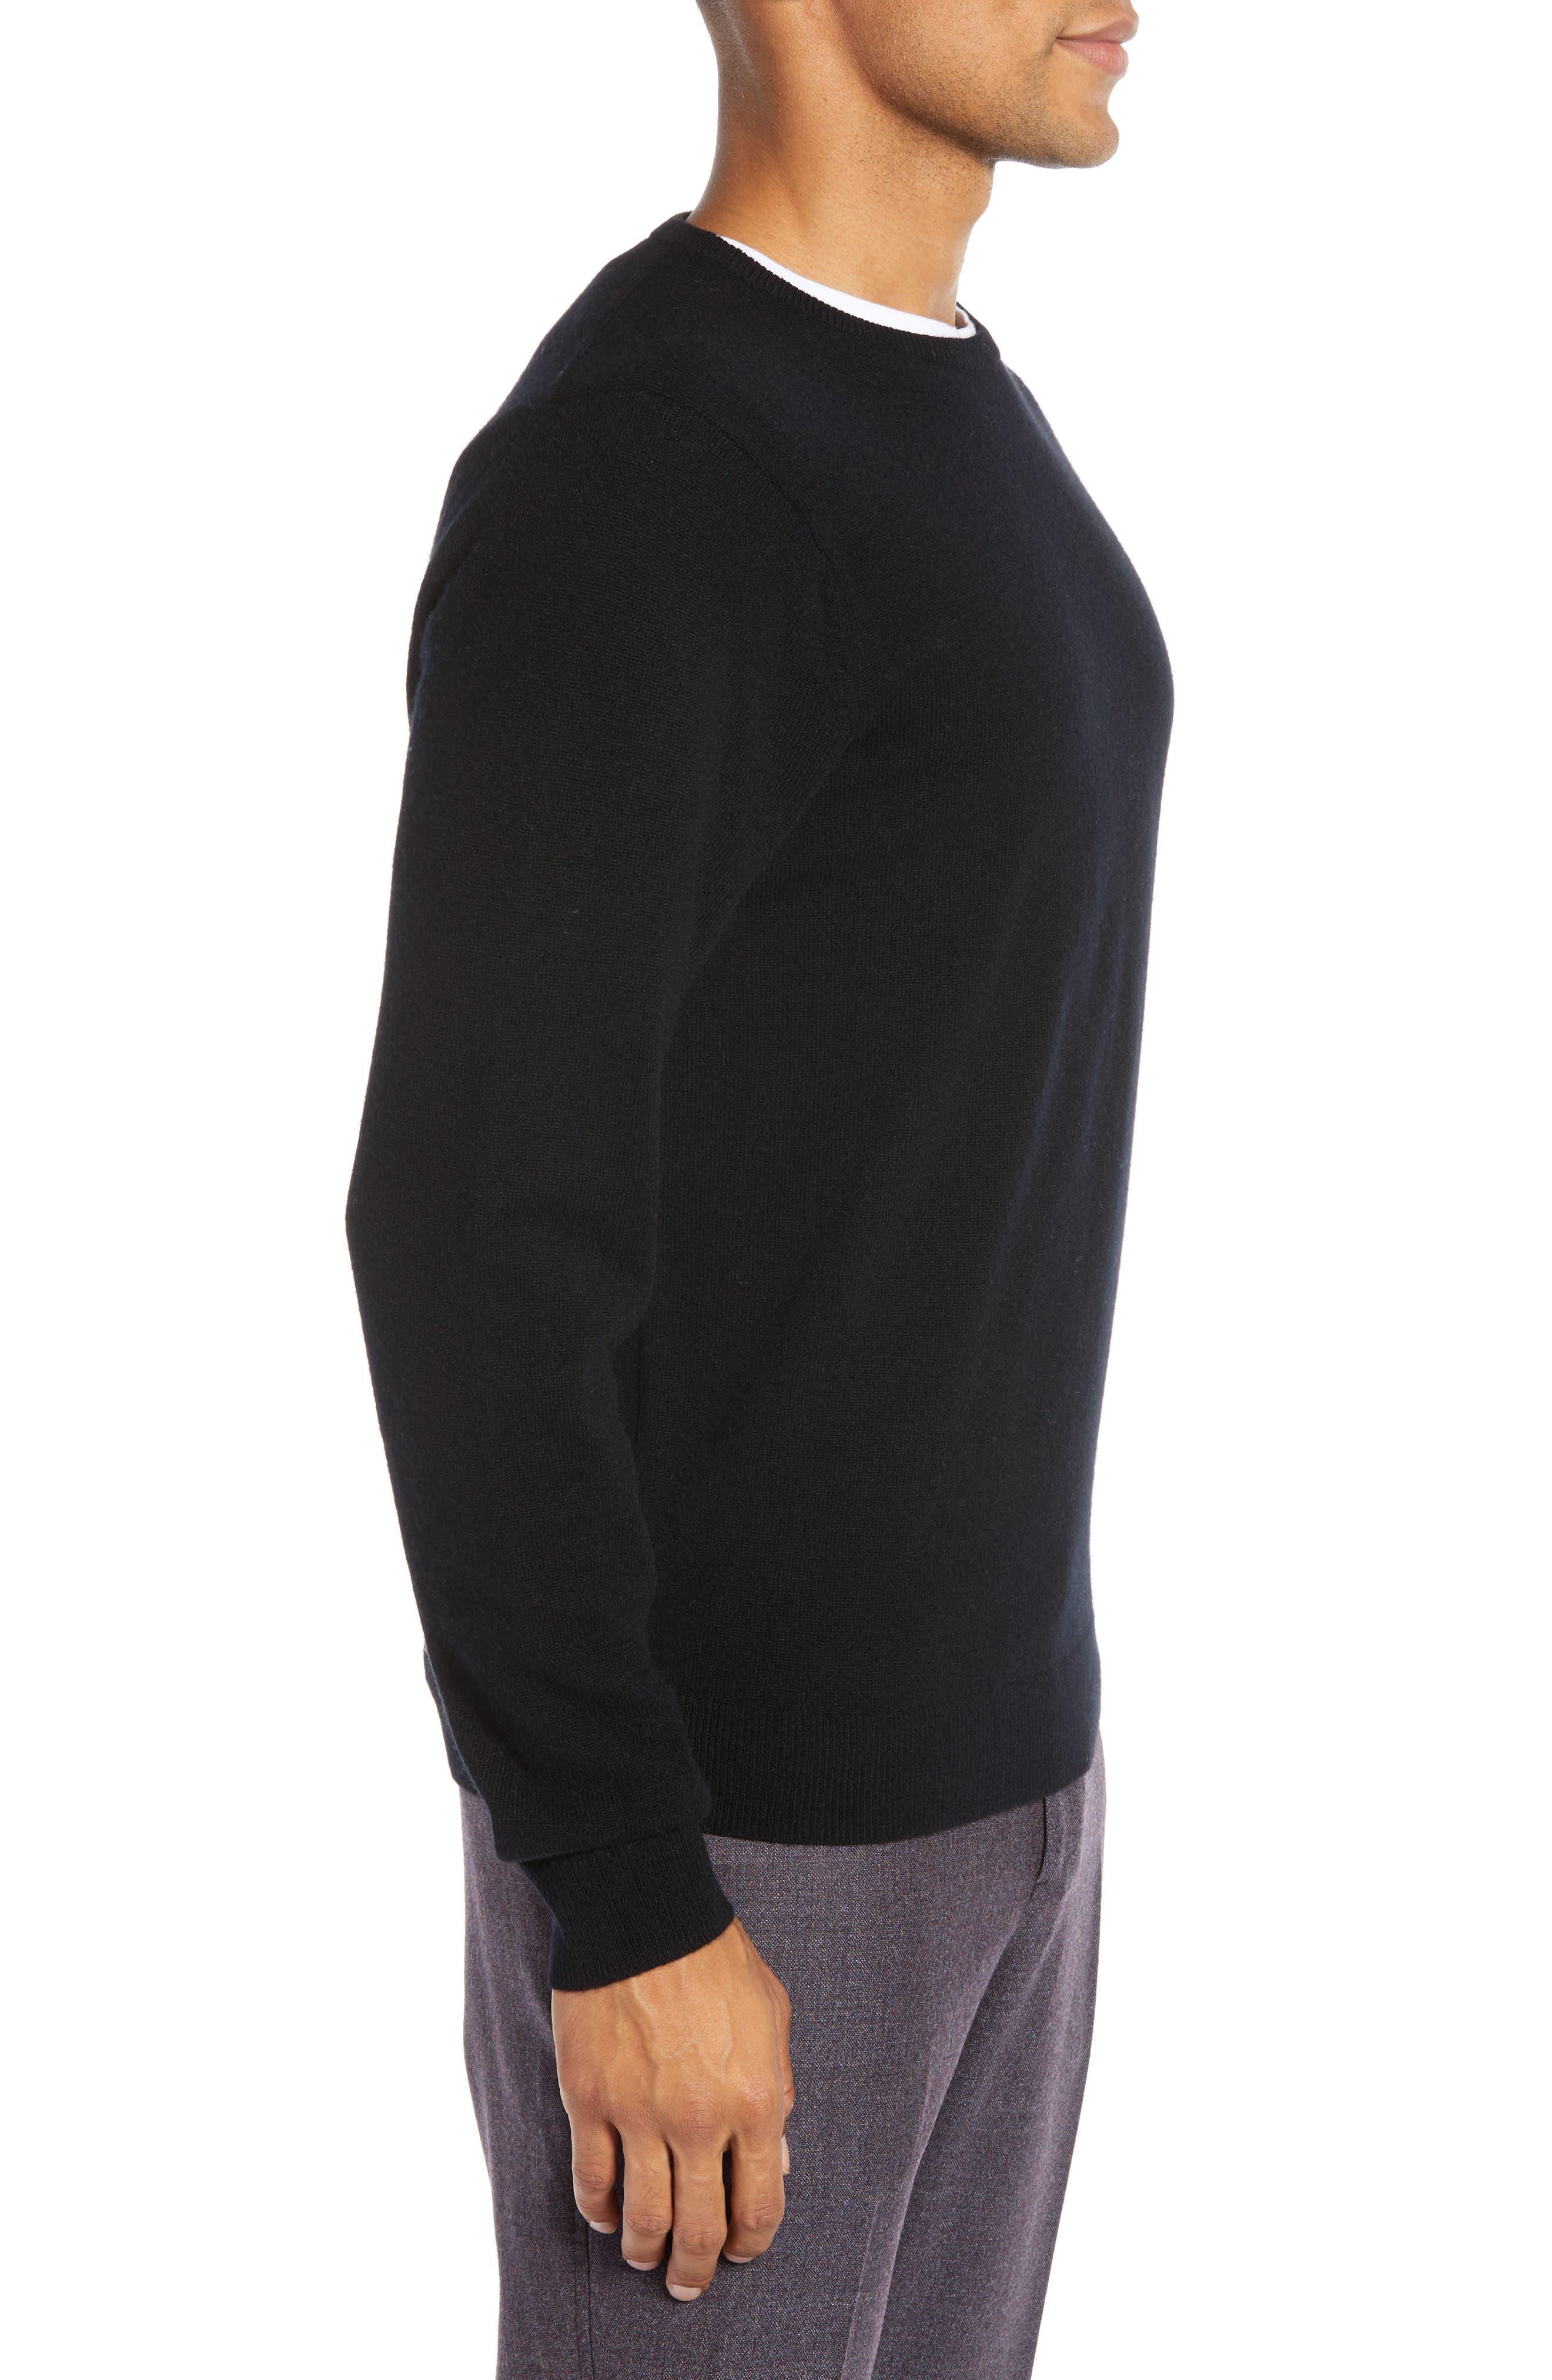 Regular Fit Wool & Cashmere Sweater,                             Alternate thumbnail 3, color,                             BLACK CAVIAR